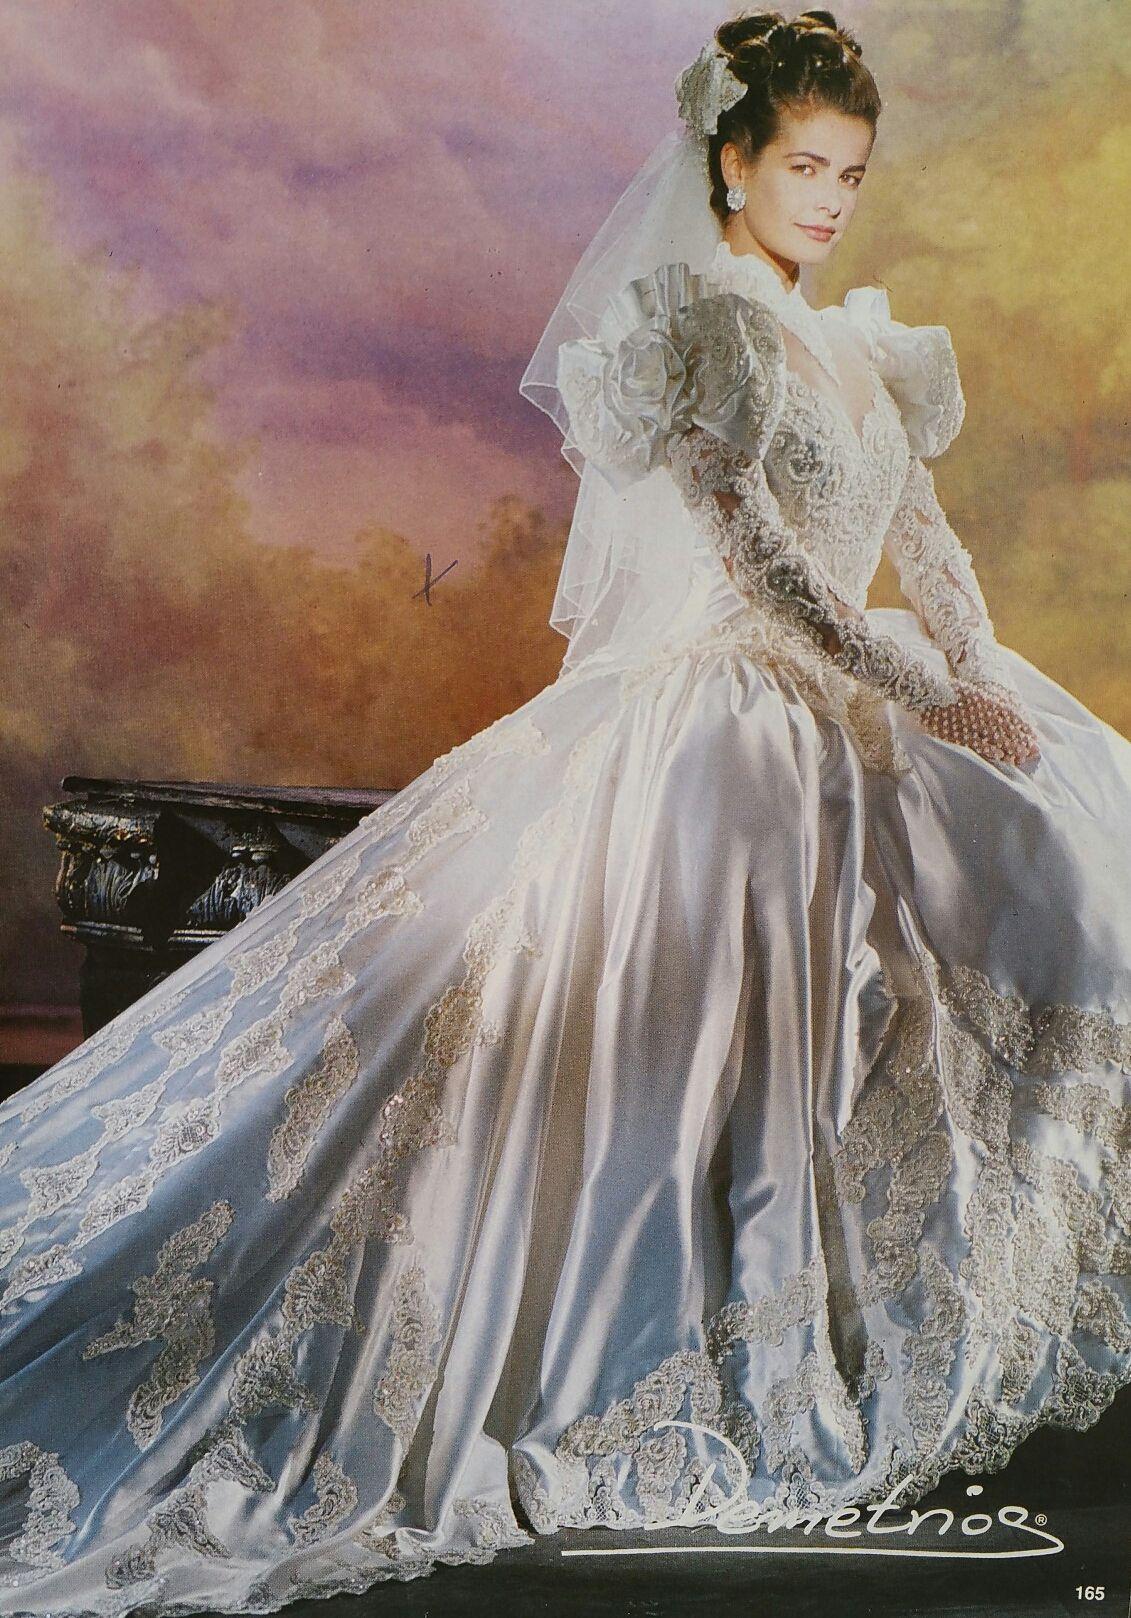 Demetrios 1992 1993 Gorgeous Wedding Dress Wedding Gowns Vintage Wedding Dresses [ 1618 x 1131 Pixel ]